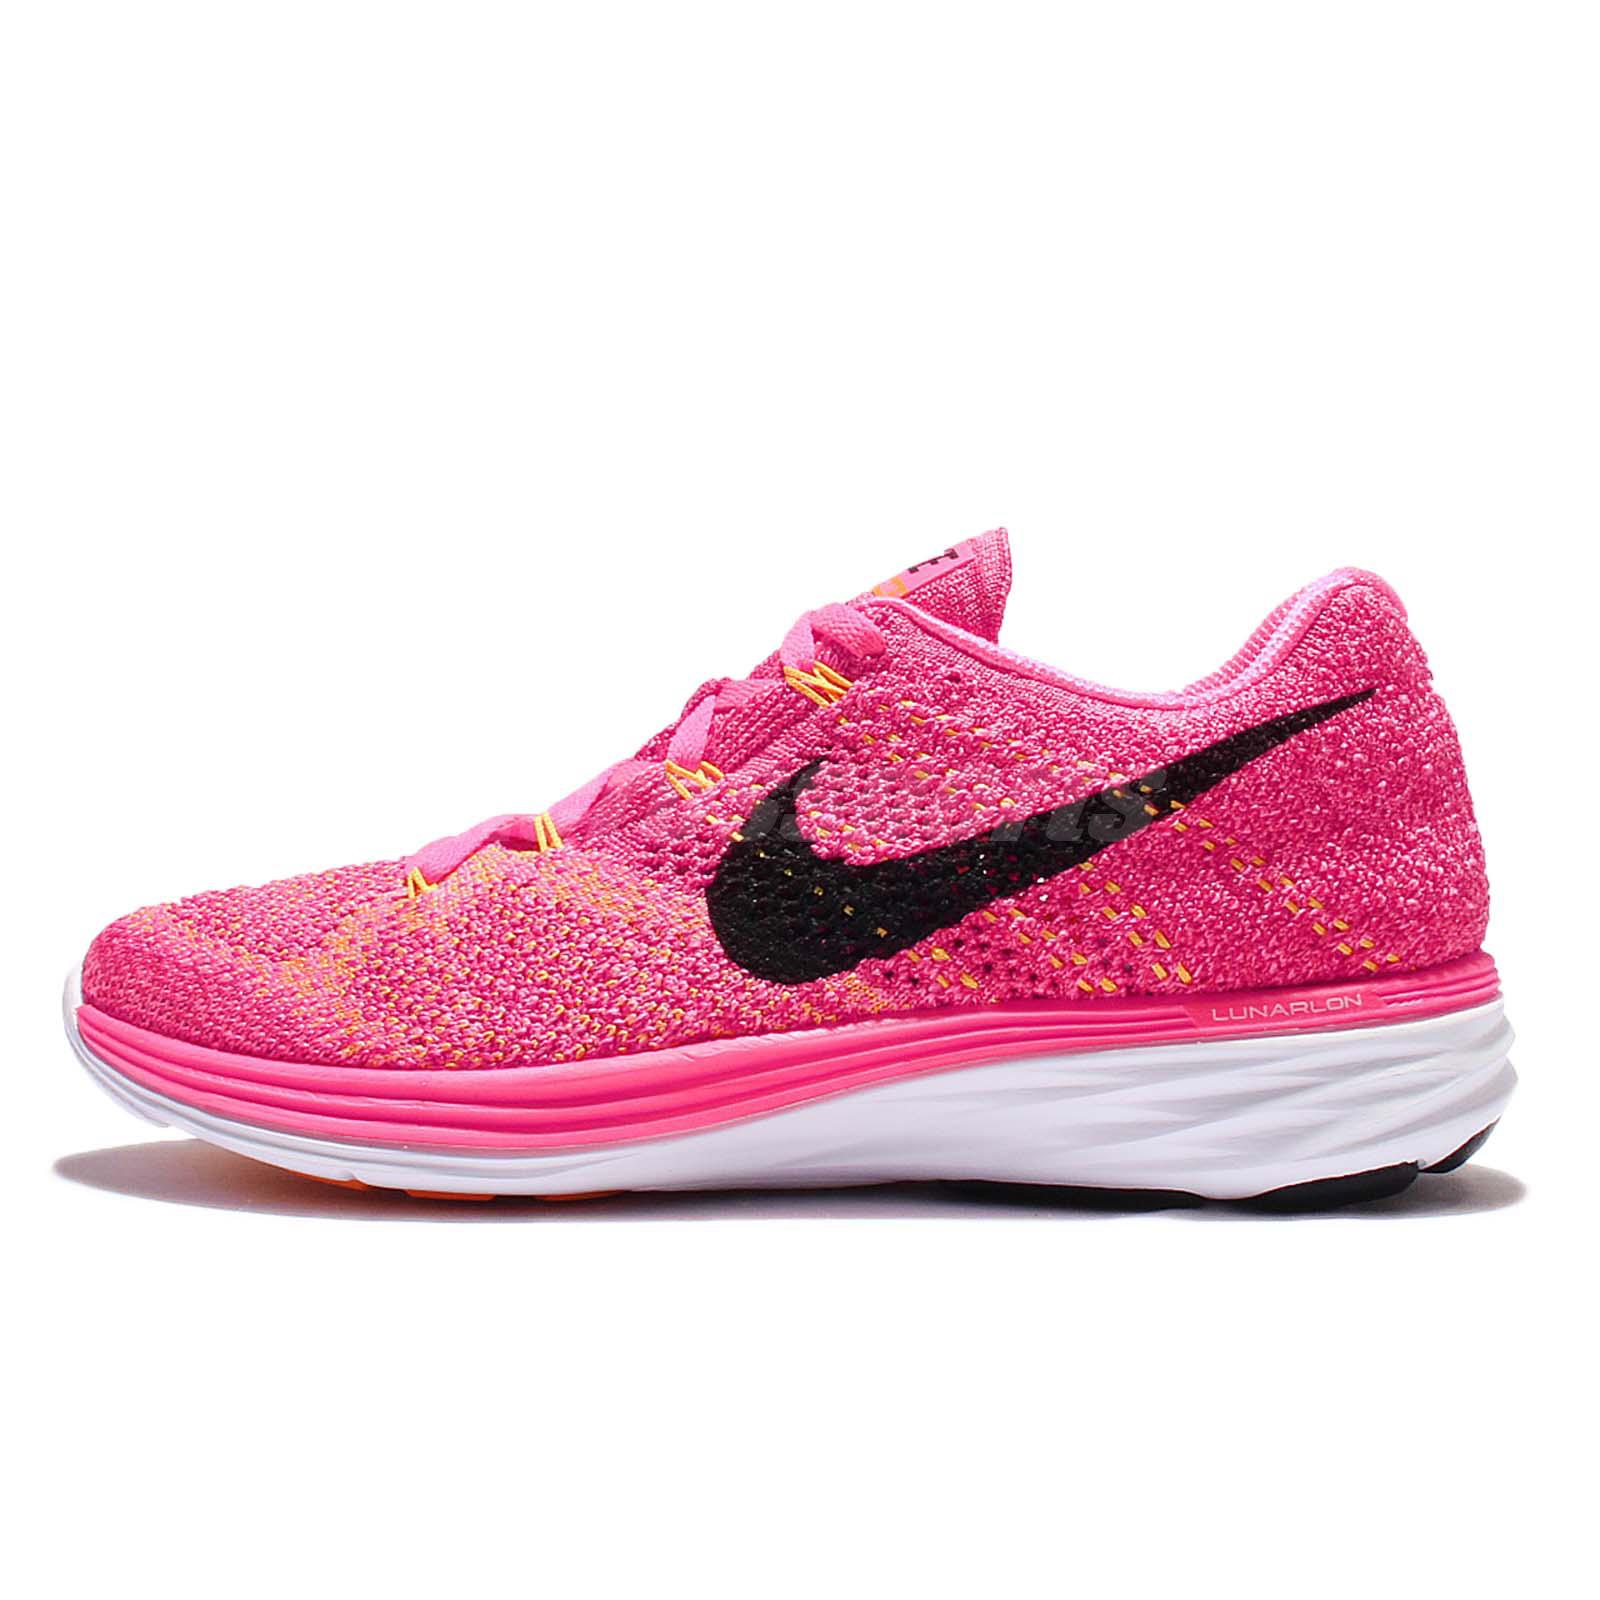 wmns nike flyknit lunar3 pink black womens running shoes